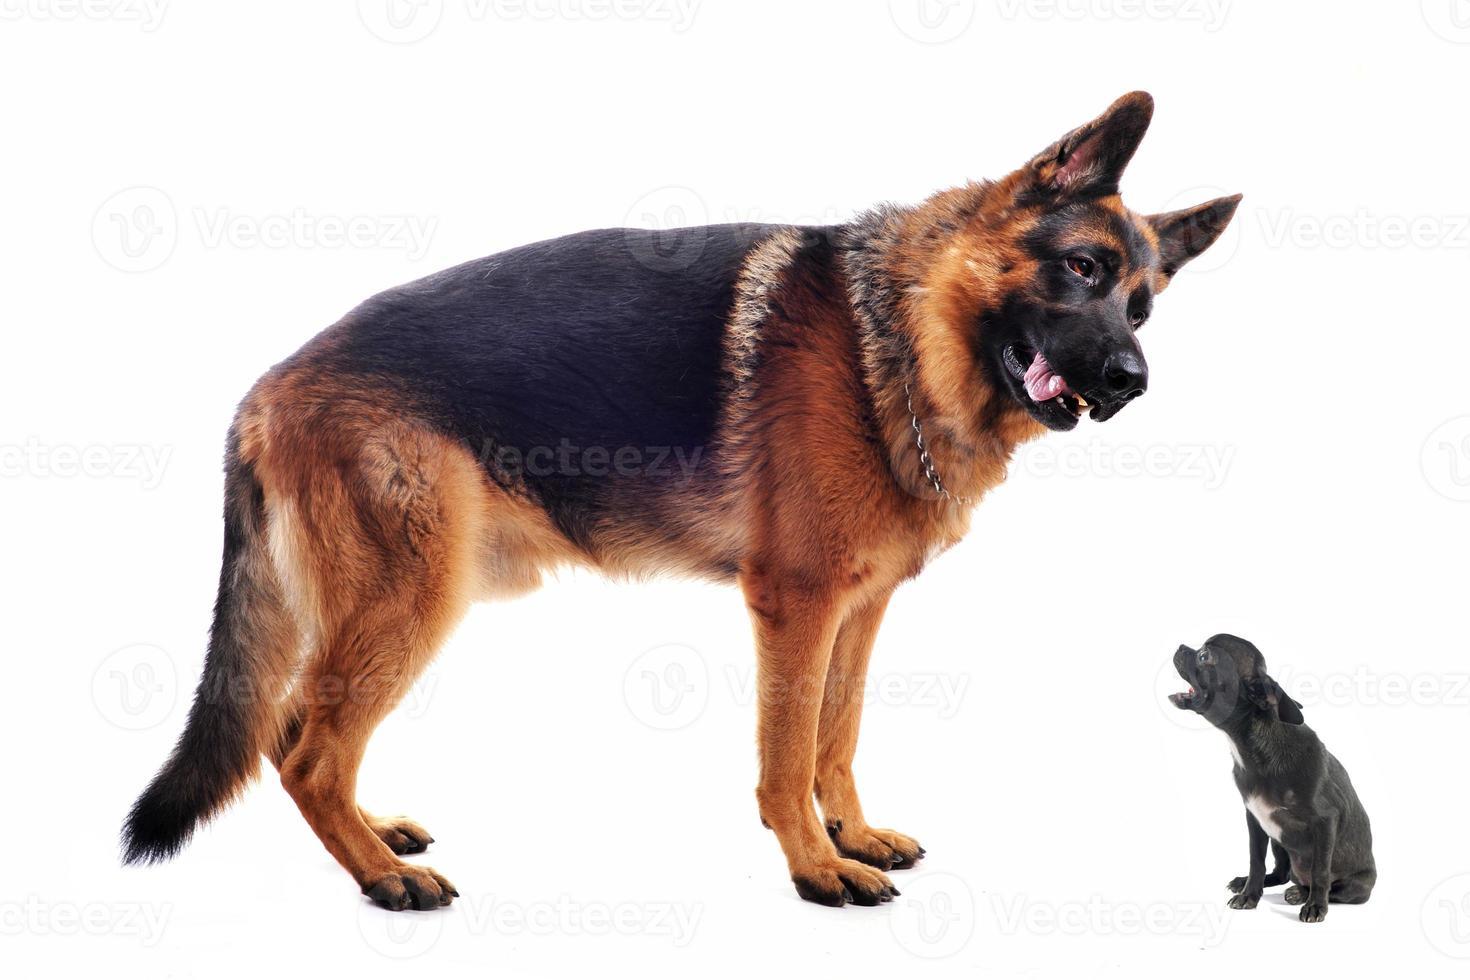 pastore tedesco e chihuahua foto